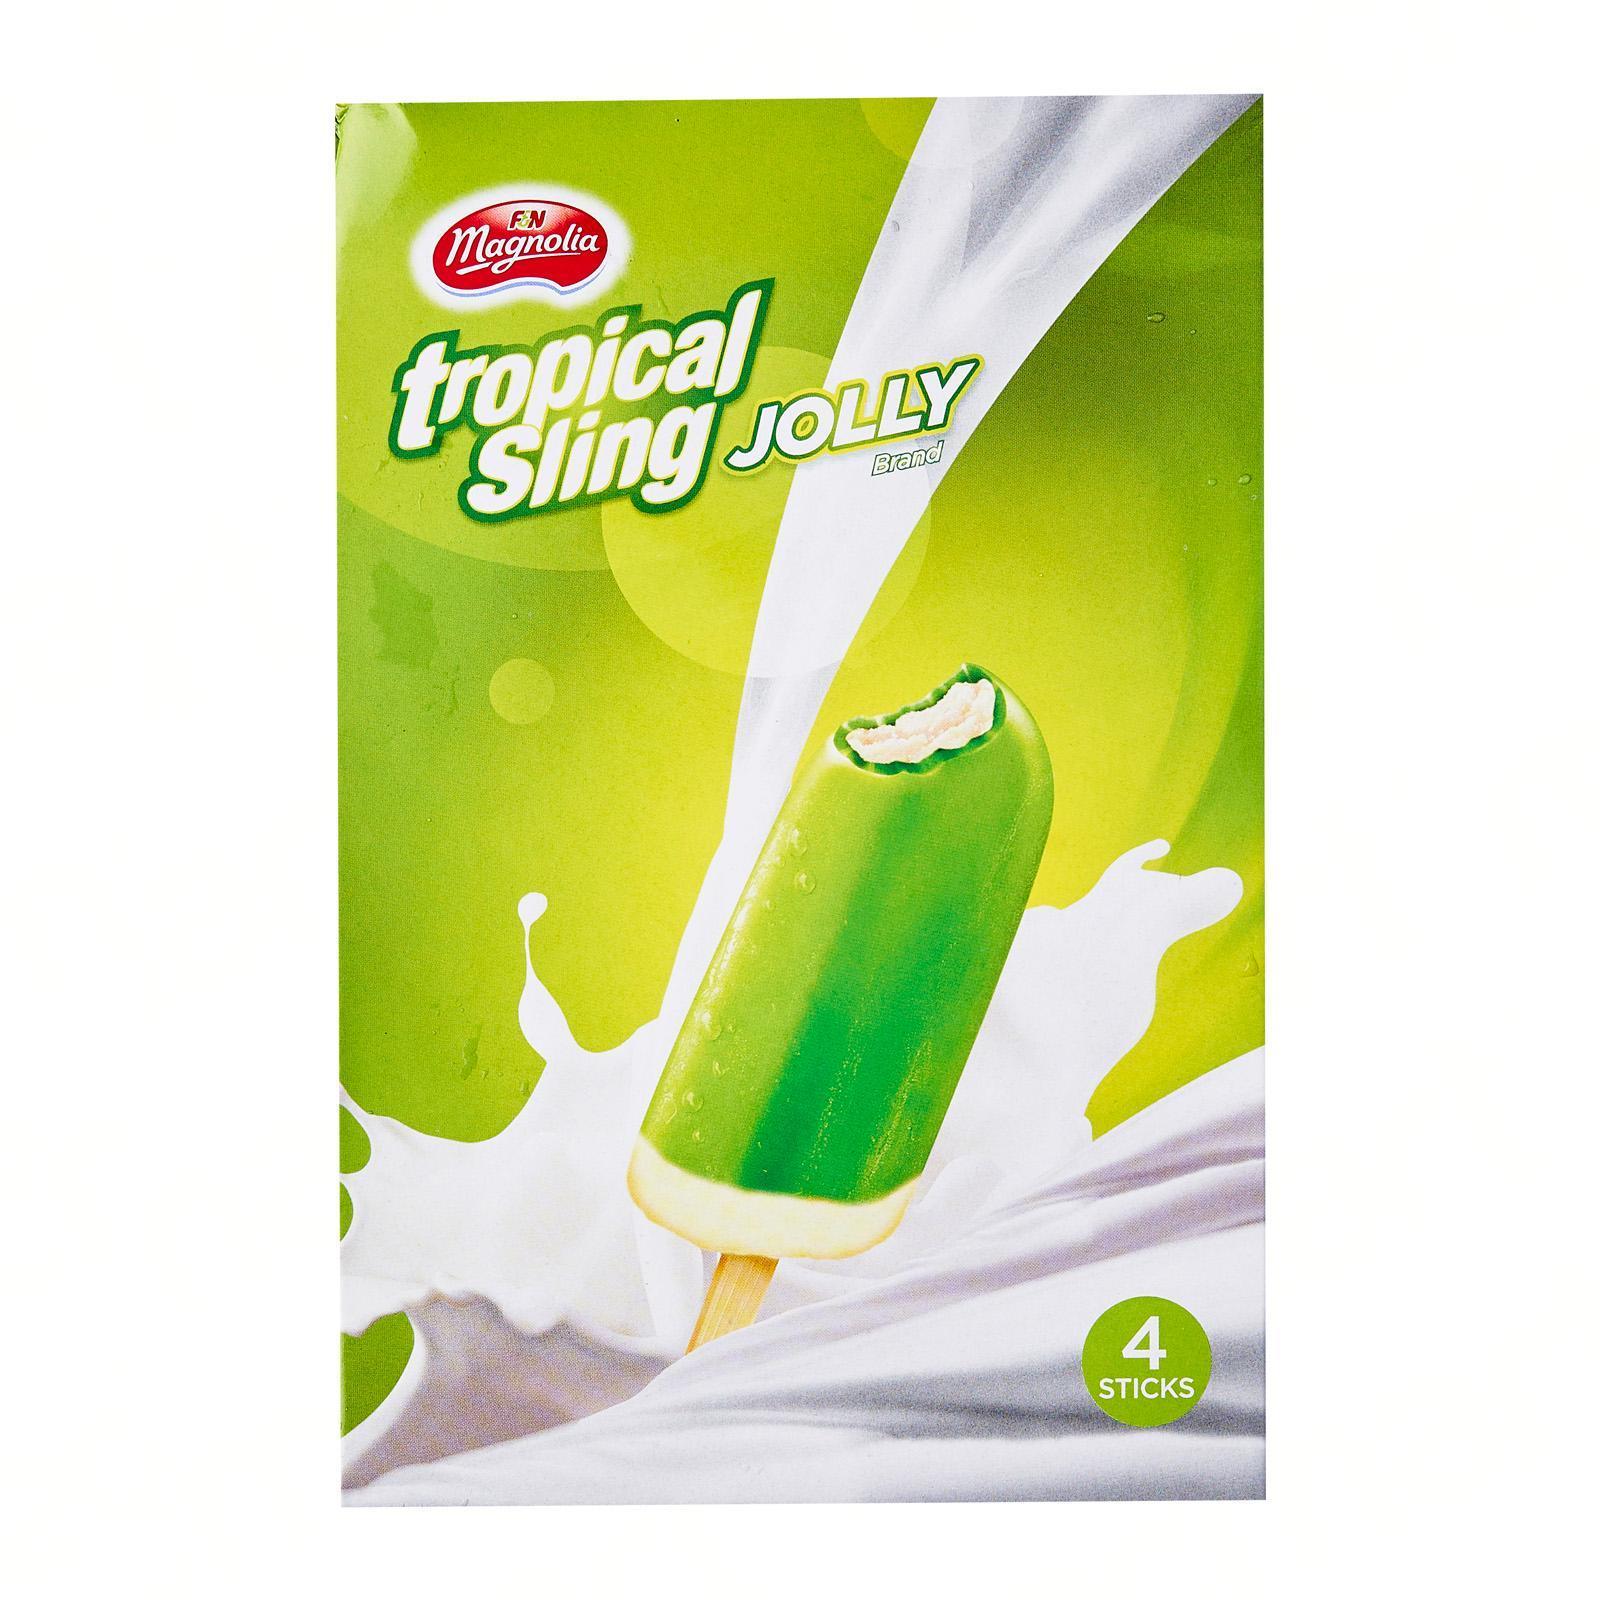 Magnolia Tropical Sling Jolly Ice Cream